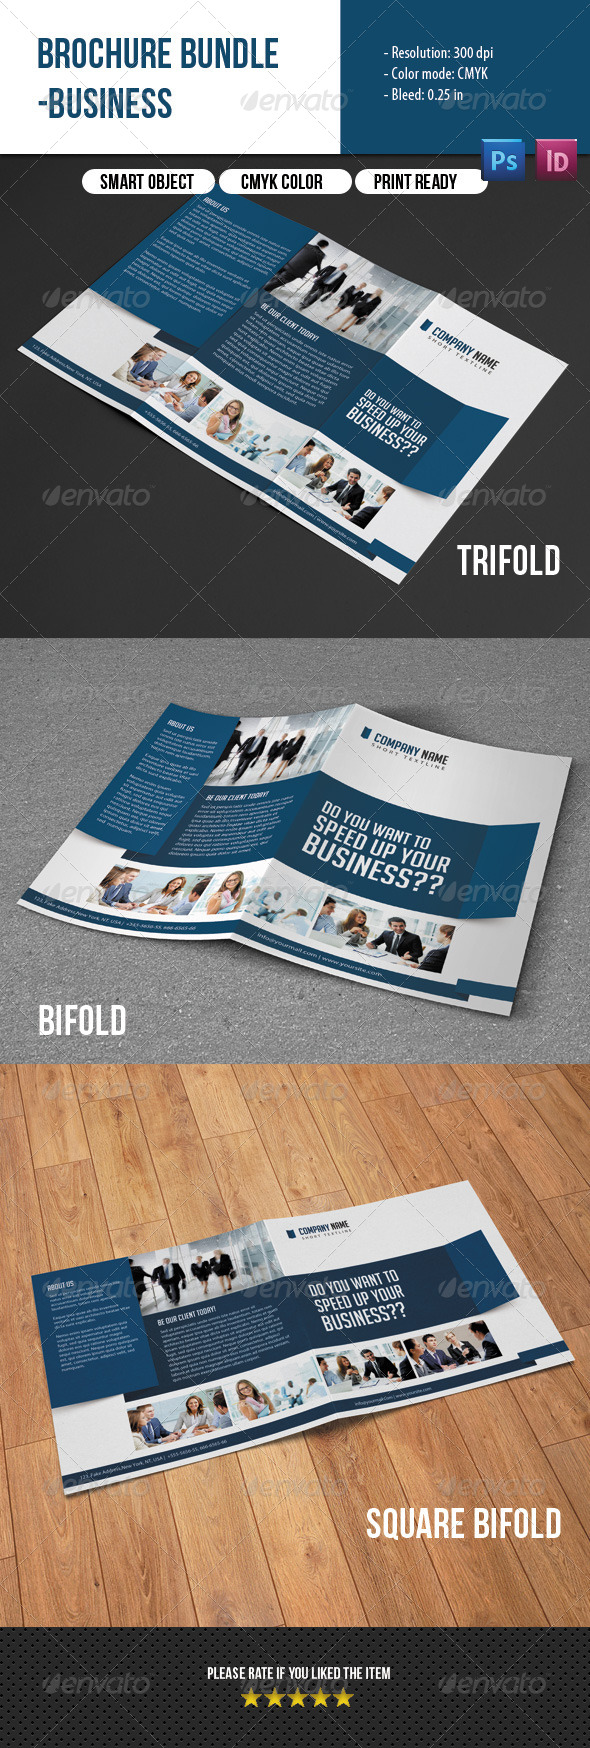 GraphicRiver Business Brochure Bundle 7519805